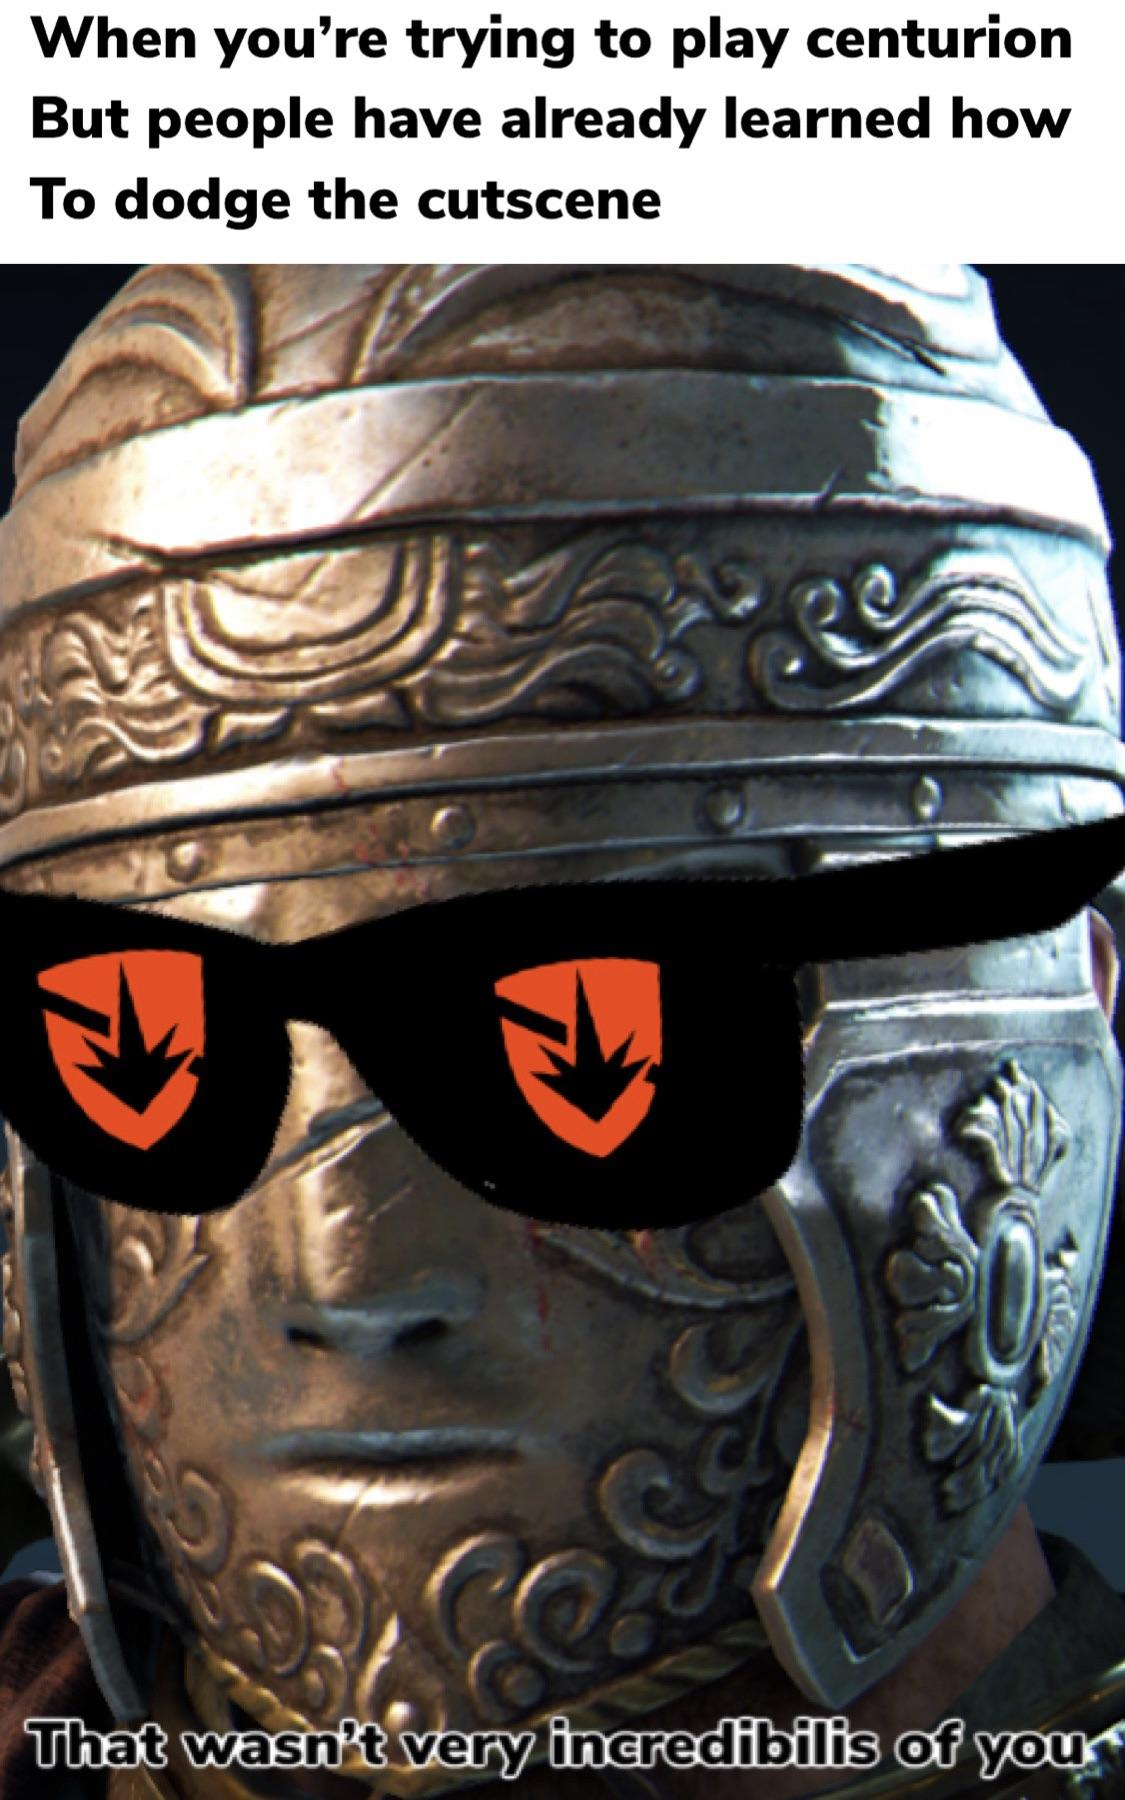 For Honor Centurion Memes : honor, centurion, memes, Roman, Meme!, Forhonor